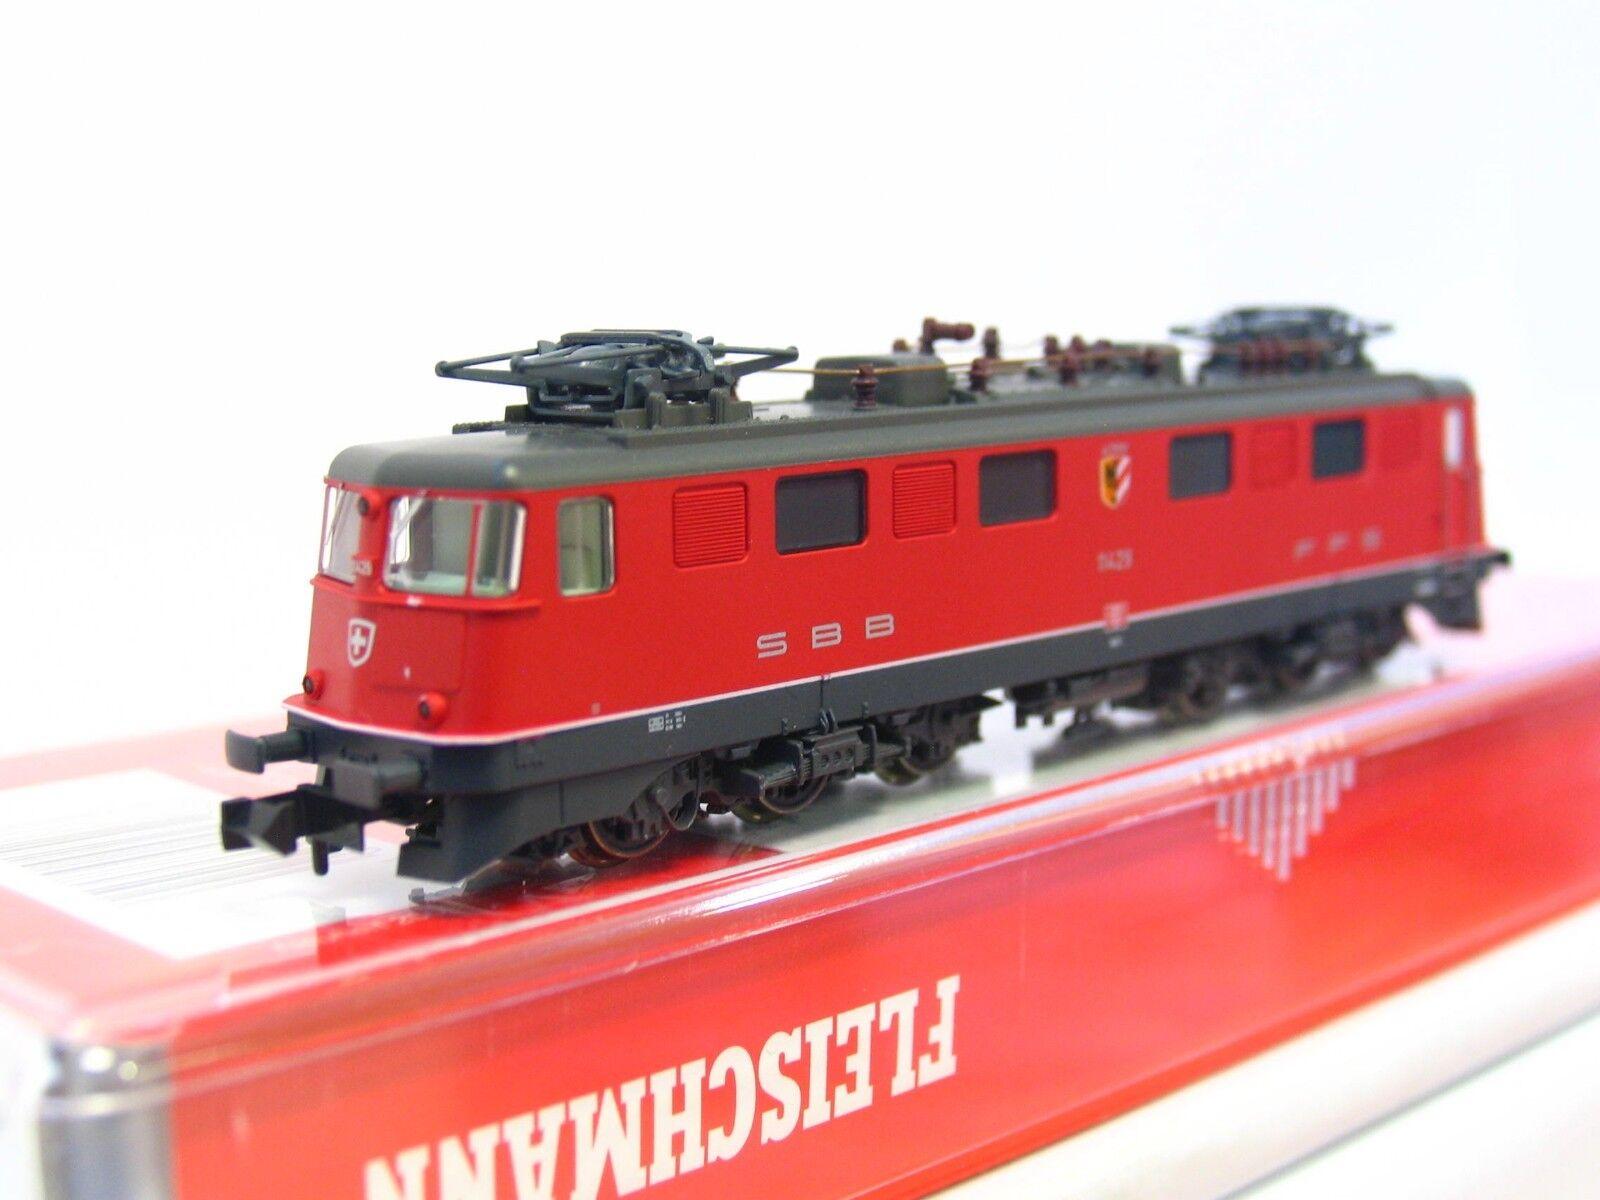 Fleischmann N 737203 E-Lok Ae 6 6 6 6 11429 Altdorf SBB CFF FFS DSS OVP (RB138) d10286